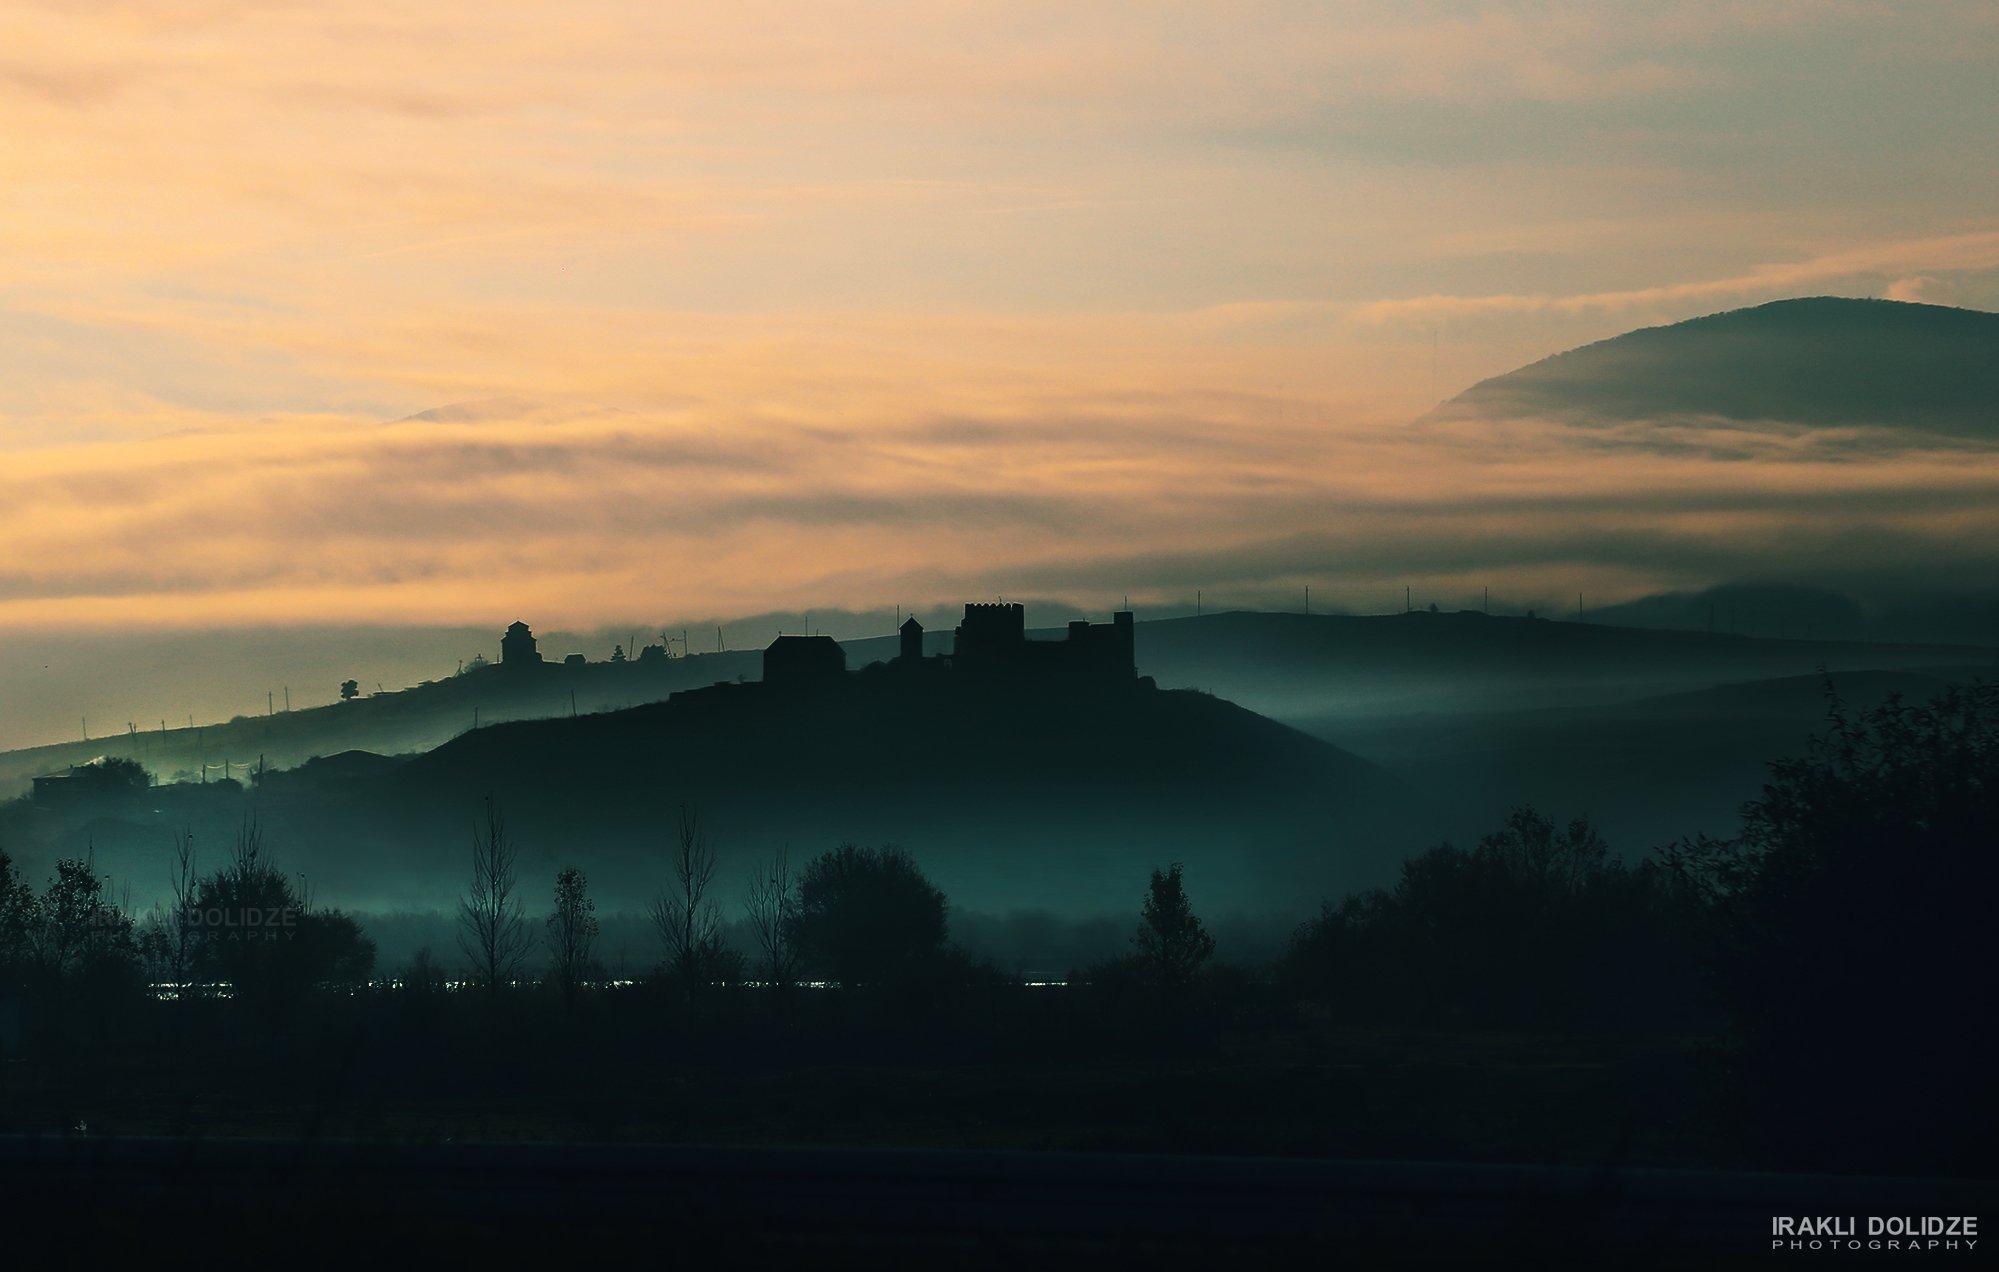 morning, fog, landscape, church, silluette, colors,, ირაკლი დოლიძე